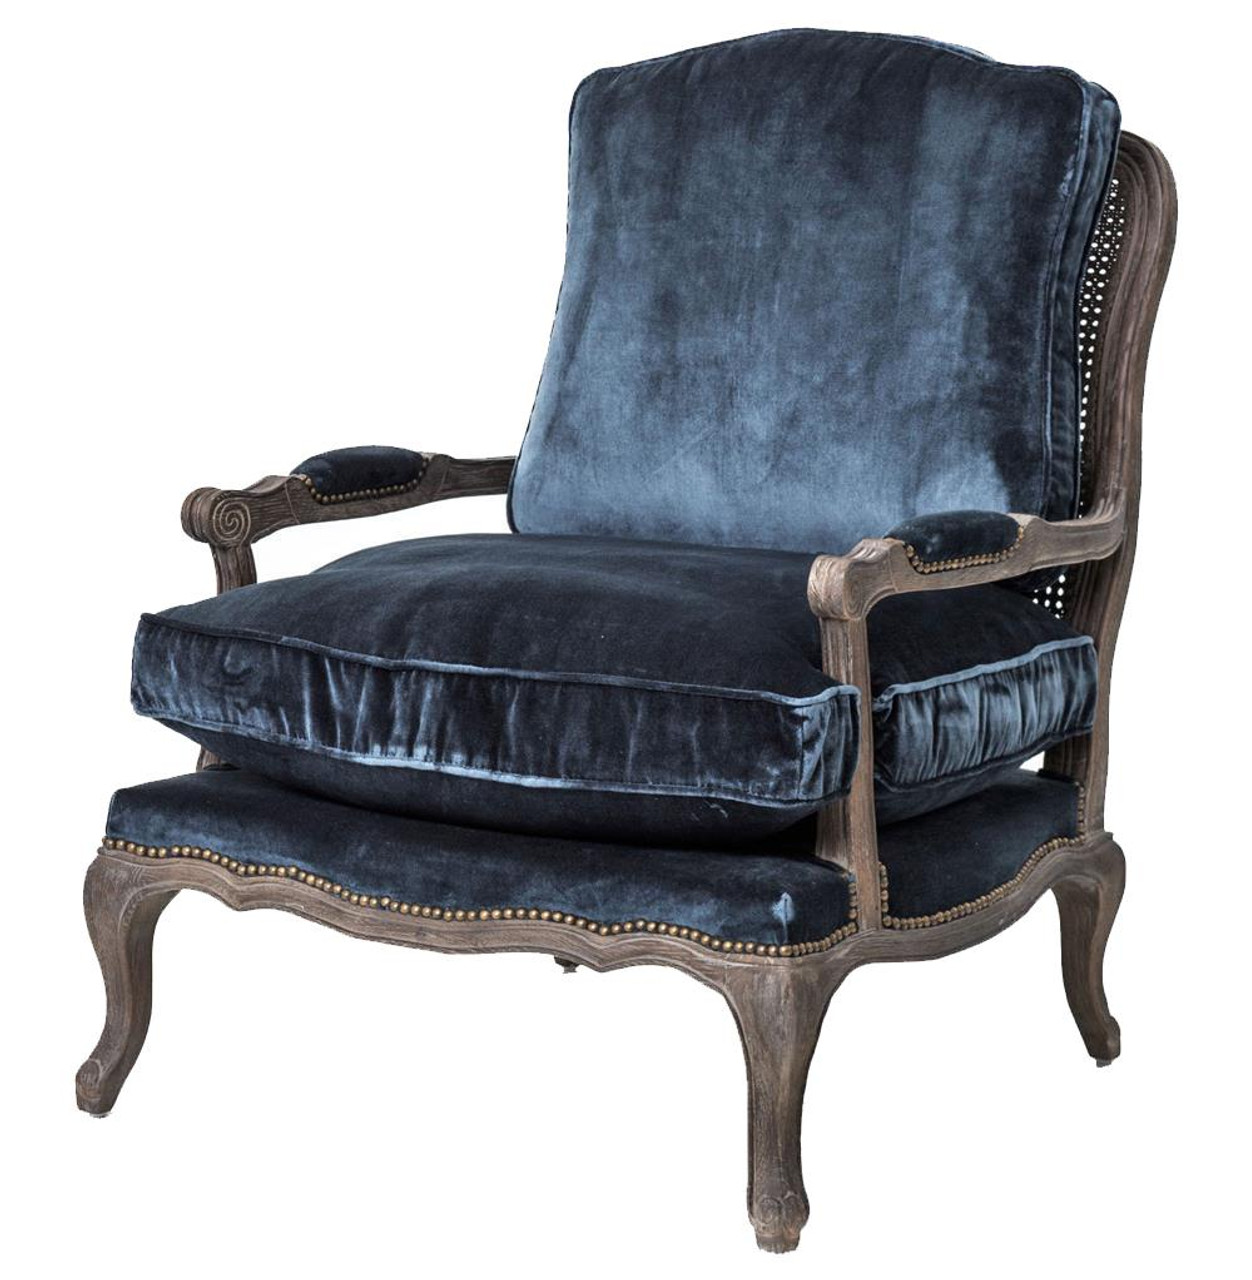 velvet accent chair. Boutique French Bergere Blue Velvet Accent Chair R